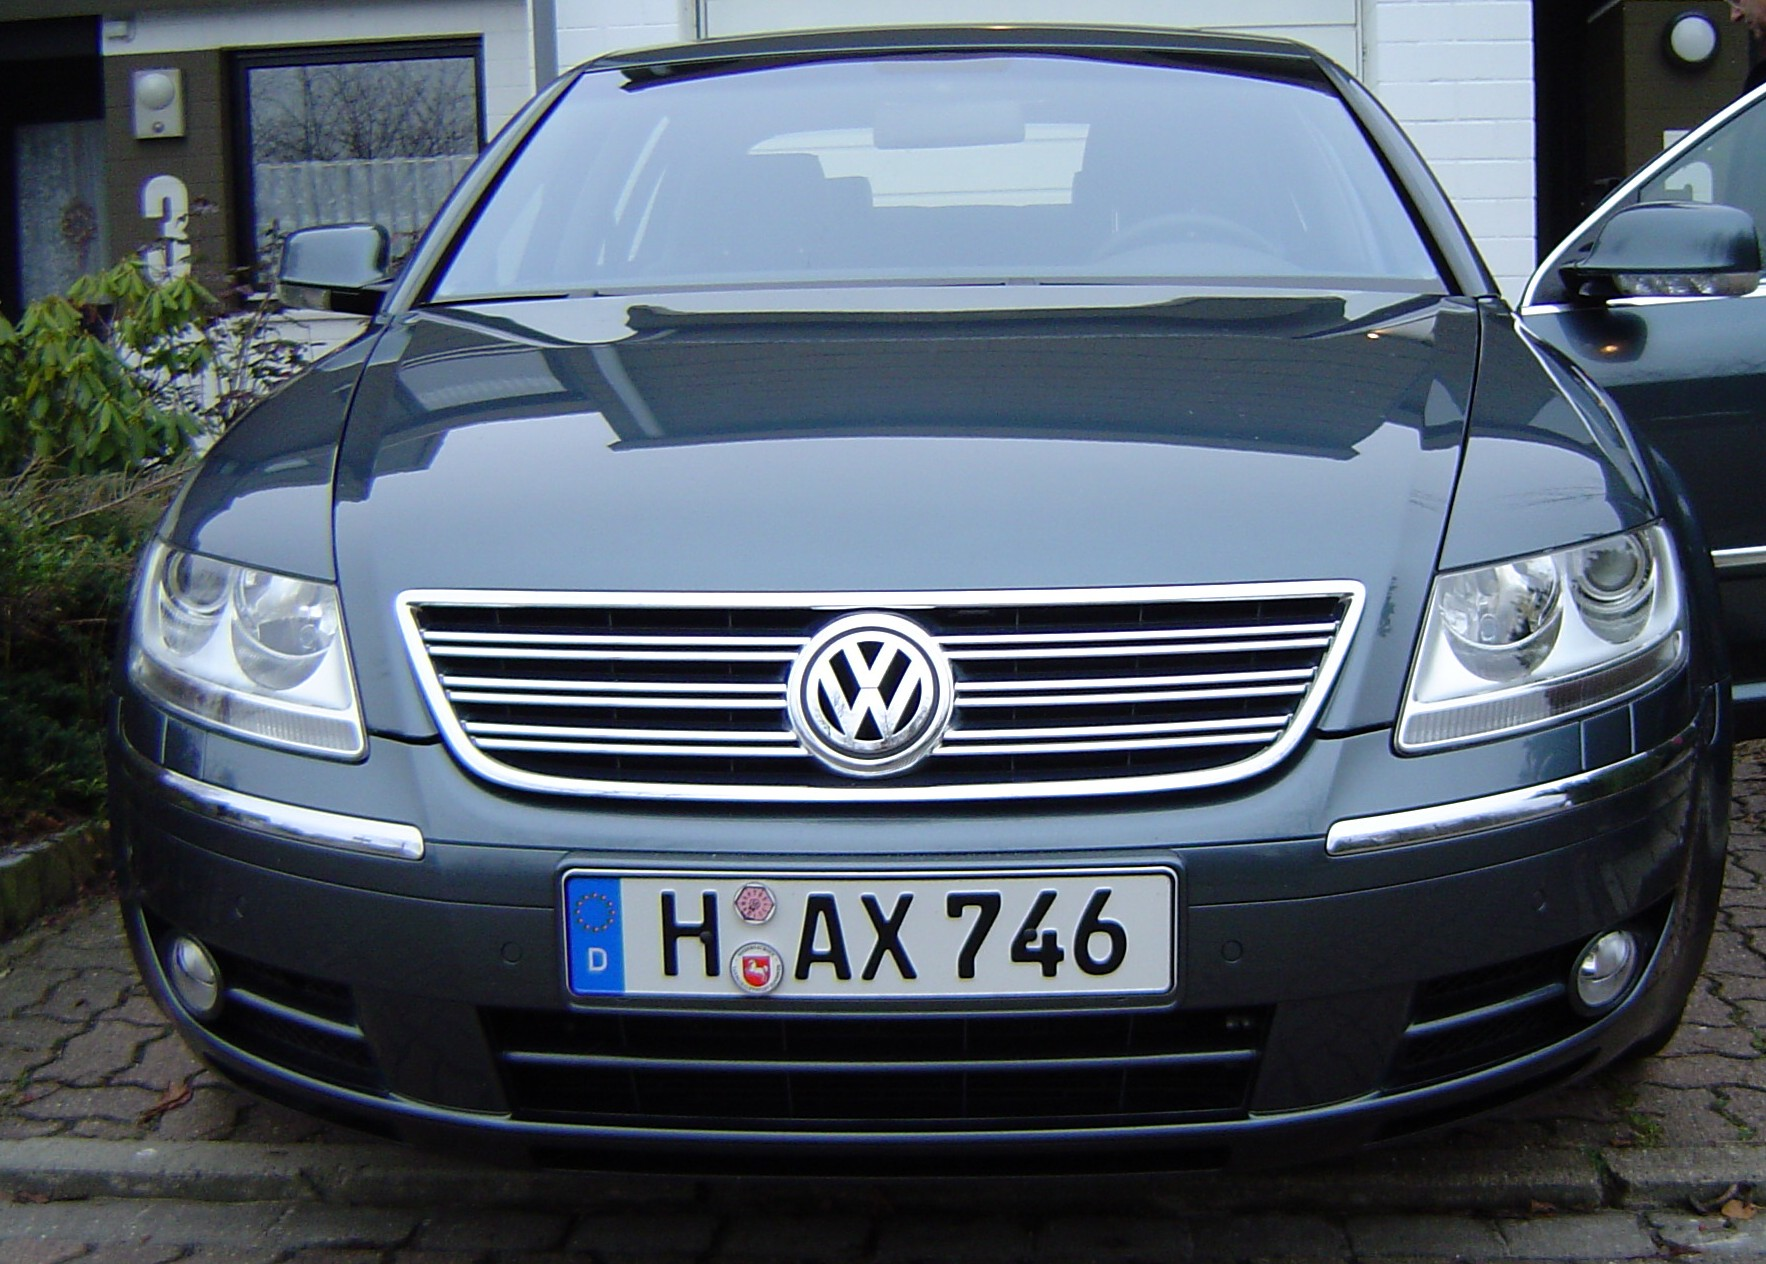 VW Phaeton 4.2